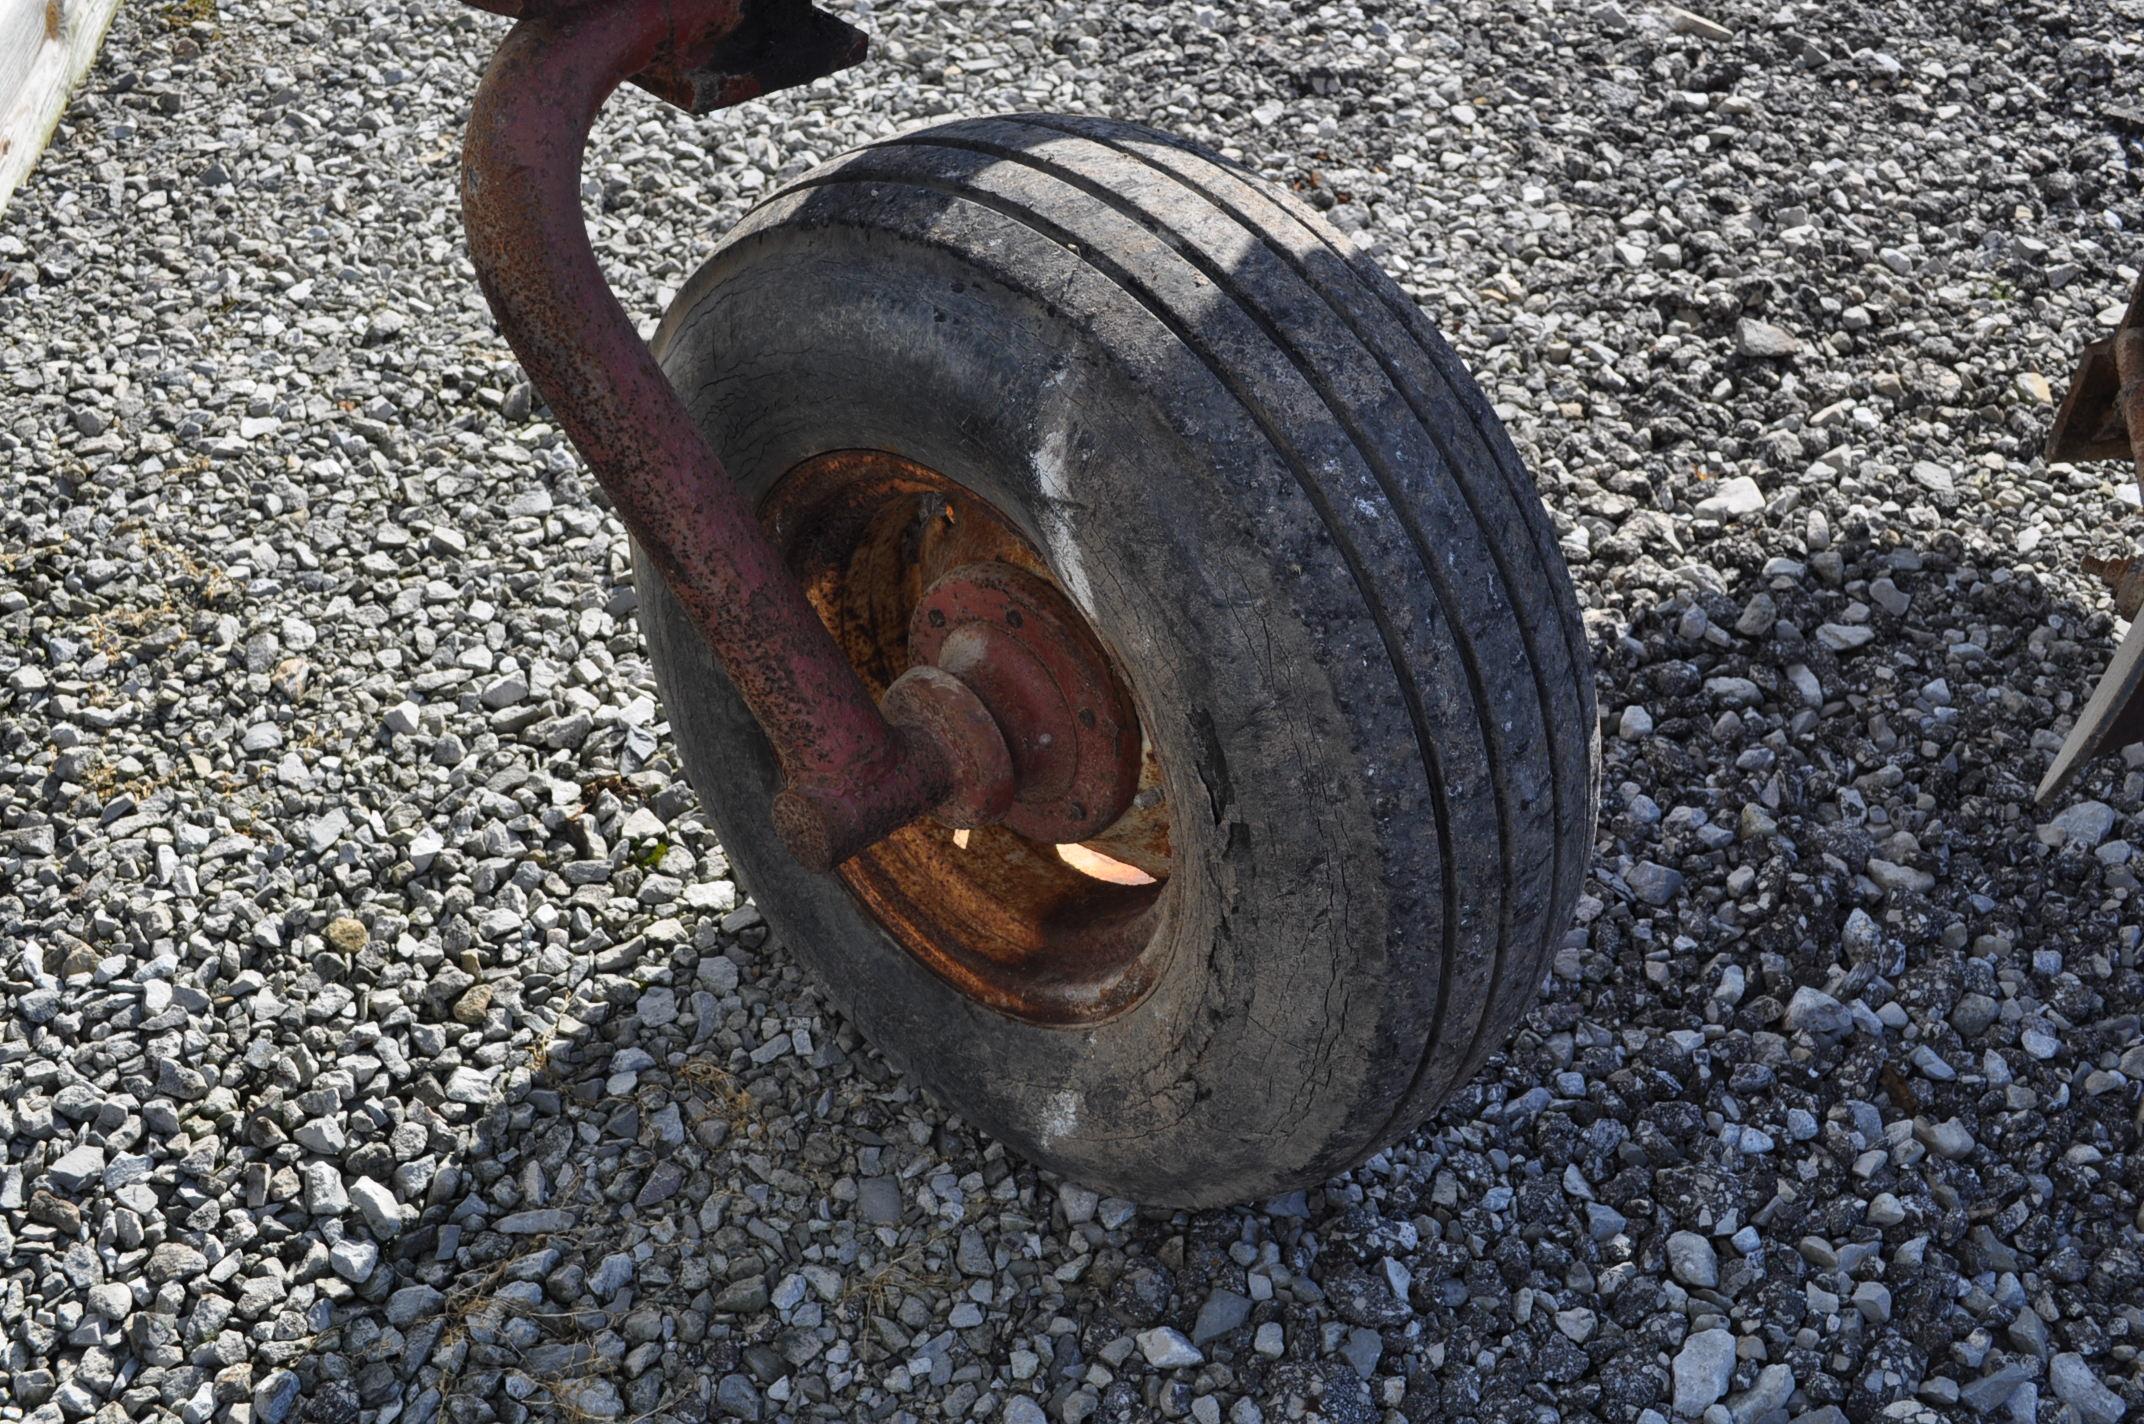 International 700 onland moldboard plow, 7 btm, auto reset trip - Image 7 of 16